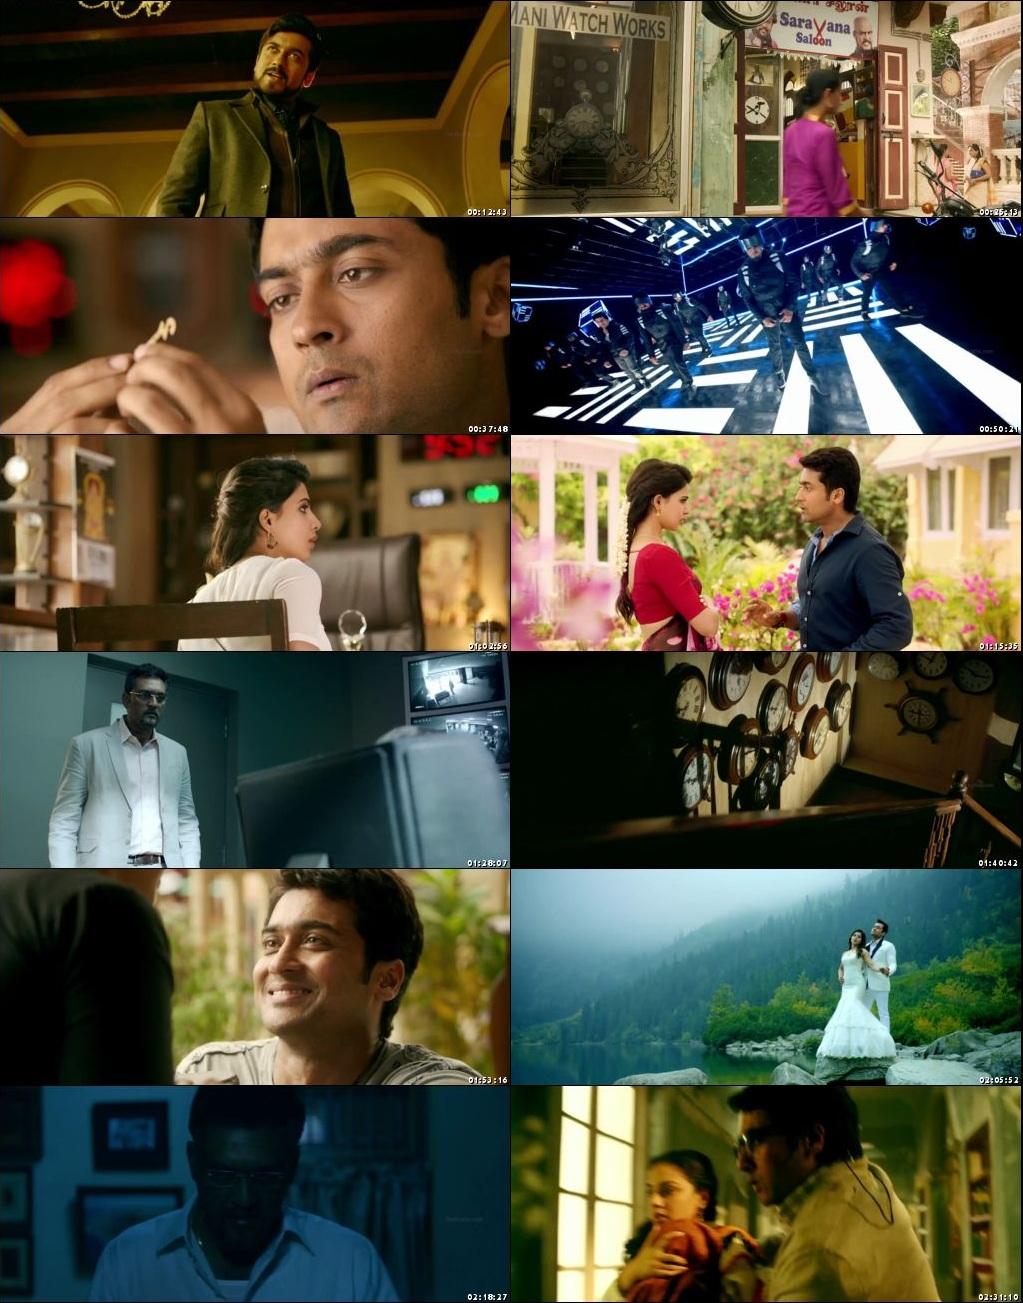 24 2016 Telugu full movie download in hindi download 720p